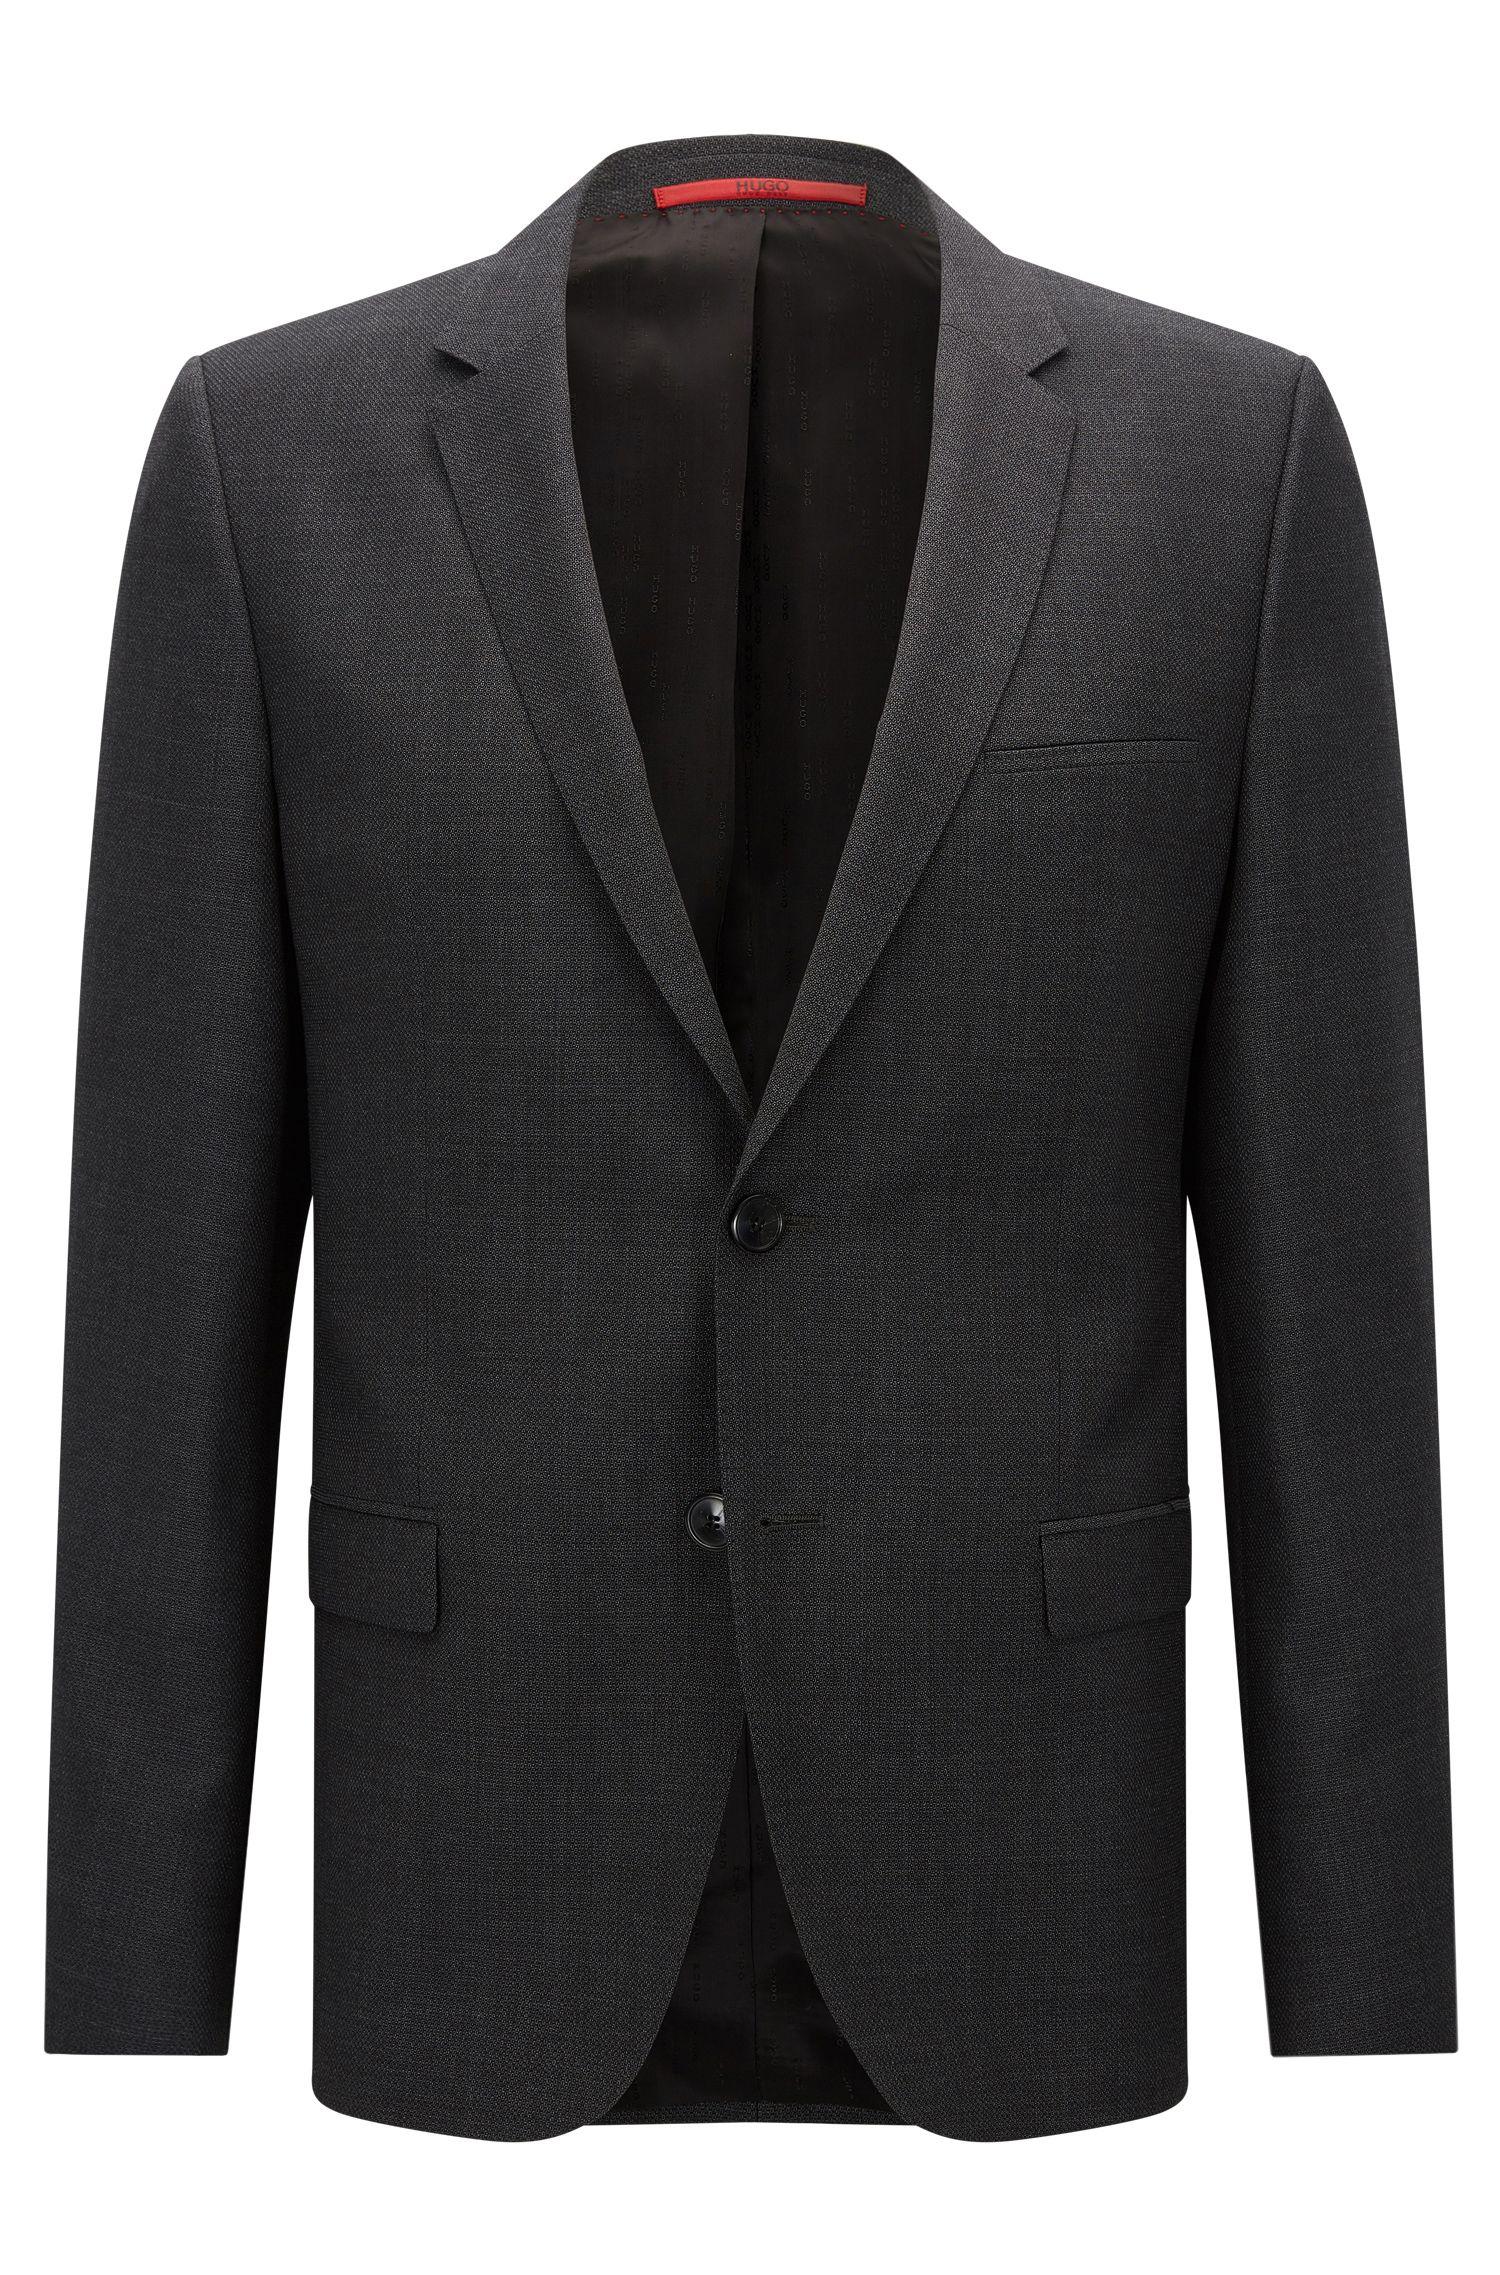 Giacca extra slim fit in lana vergine con microdisegni